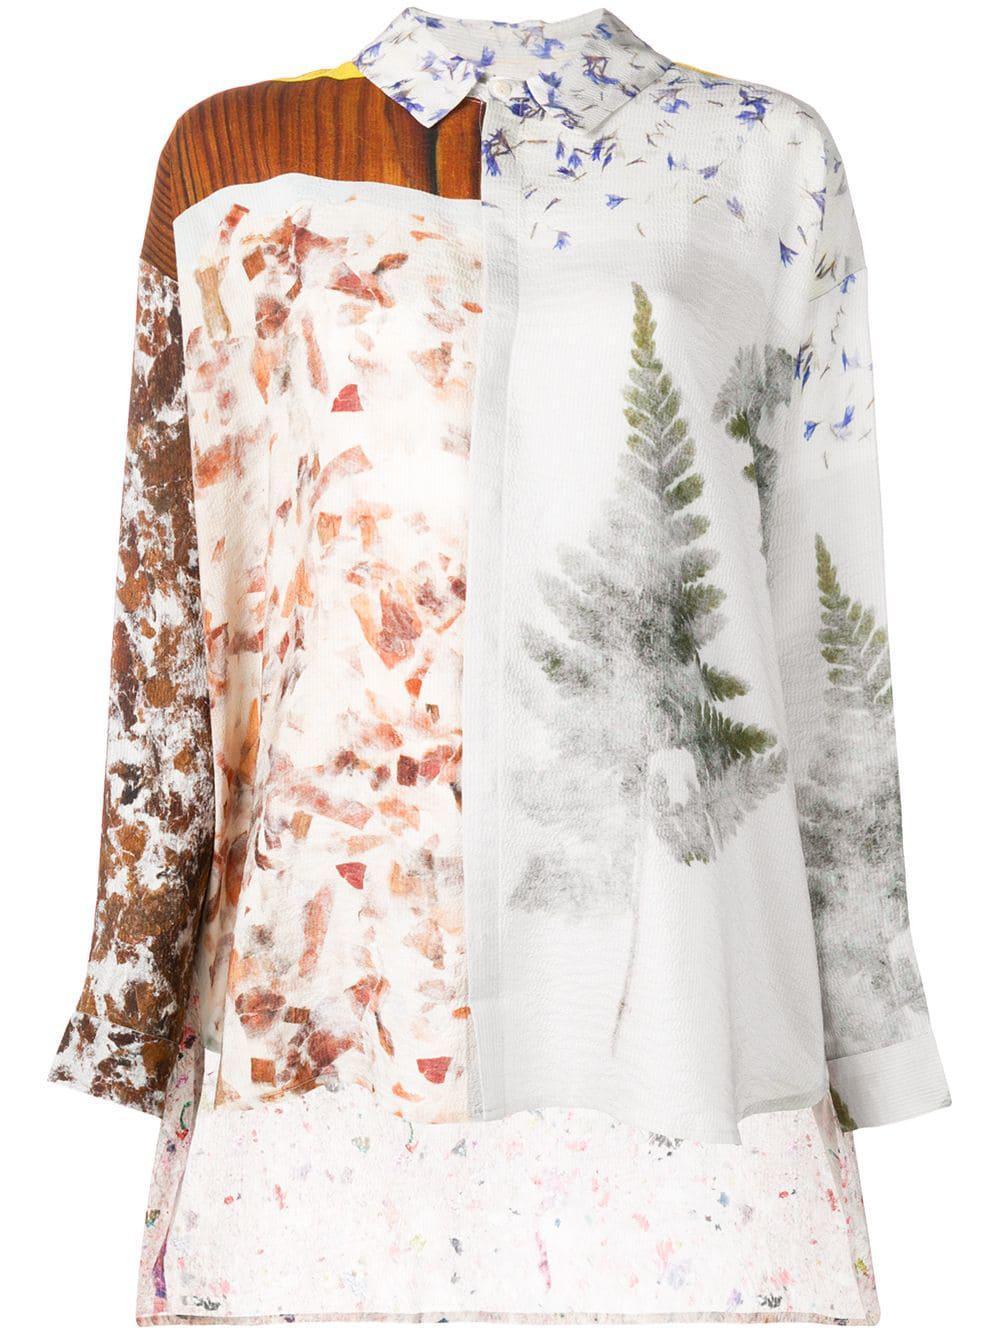 Anntian Floral Print Shirt - Grey